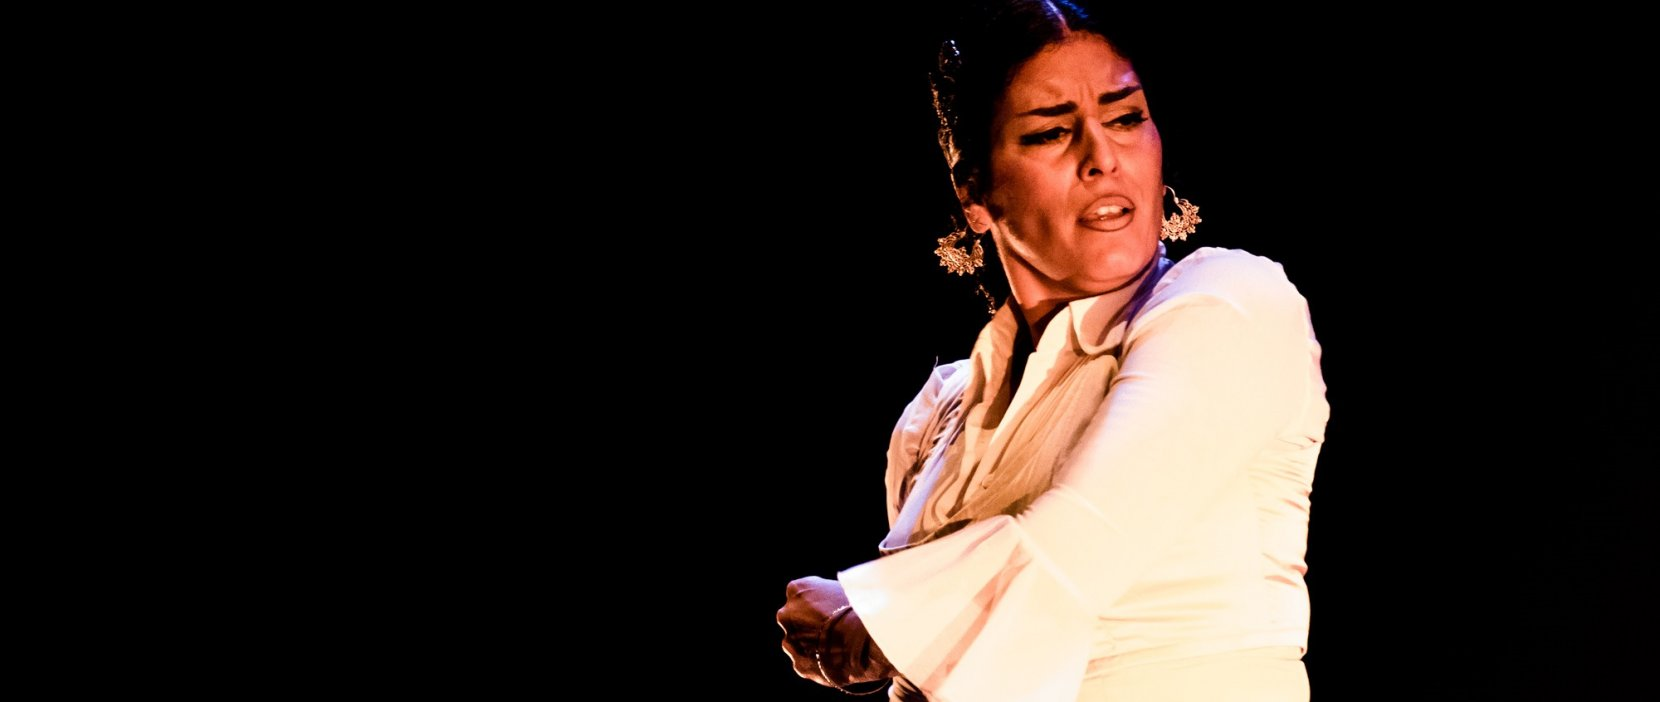 Jødisk Kulturfestival - Foto: Majbritt Press